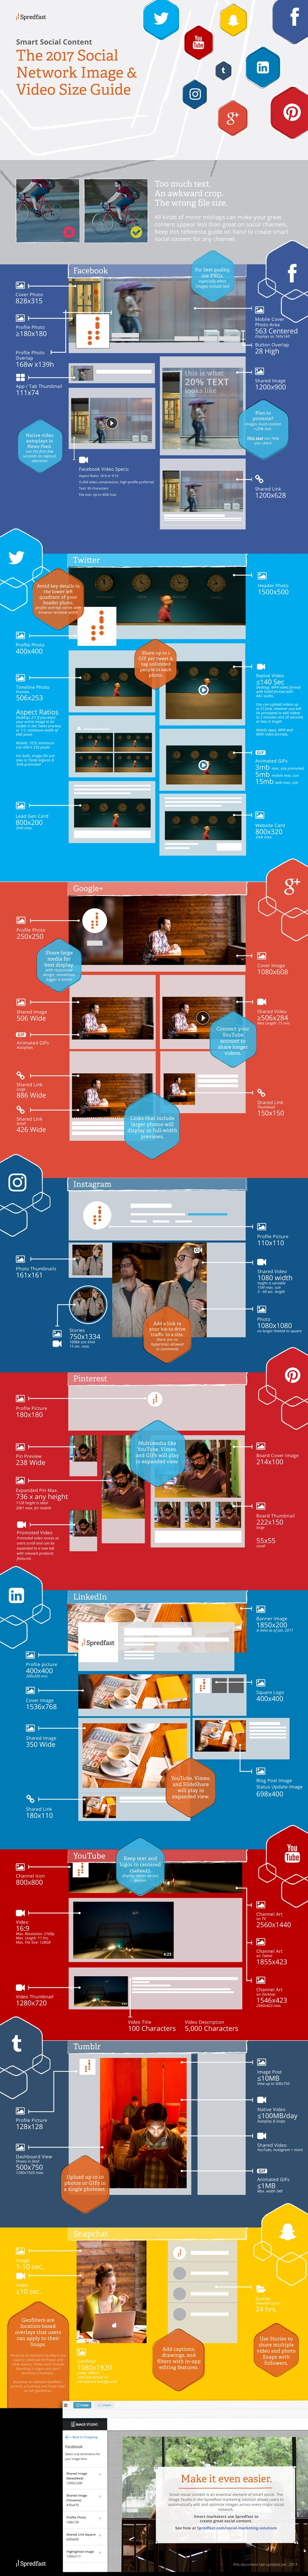 2017-sizing-for-social-media-infographic-tip-sheet-by-spredfast.jpg